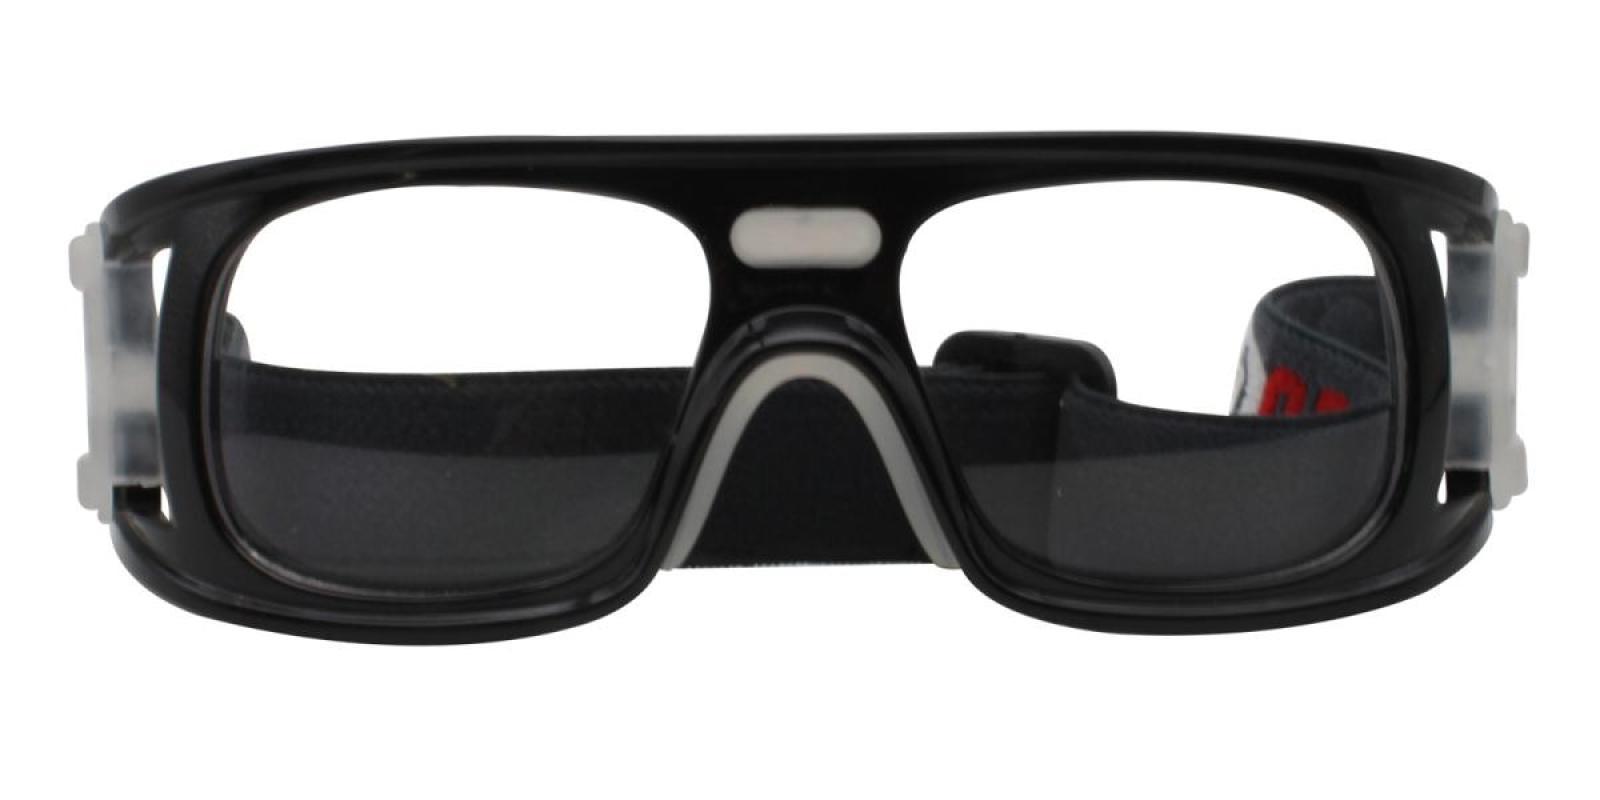 Guard-Black-Square-Plastic-SportsGlasses-additional2